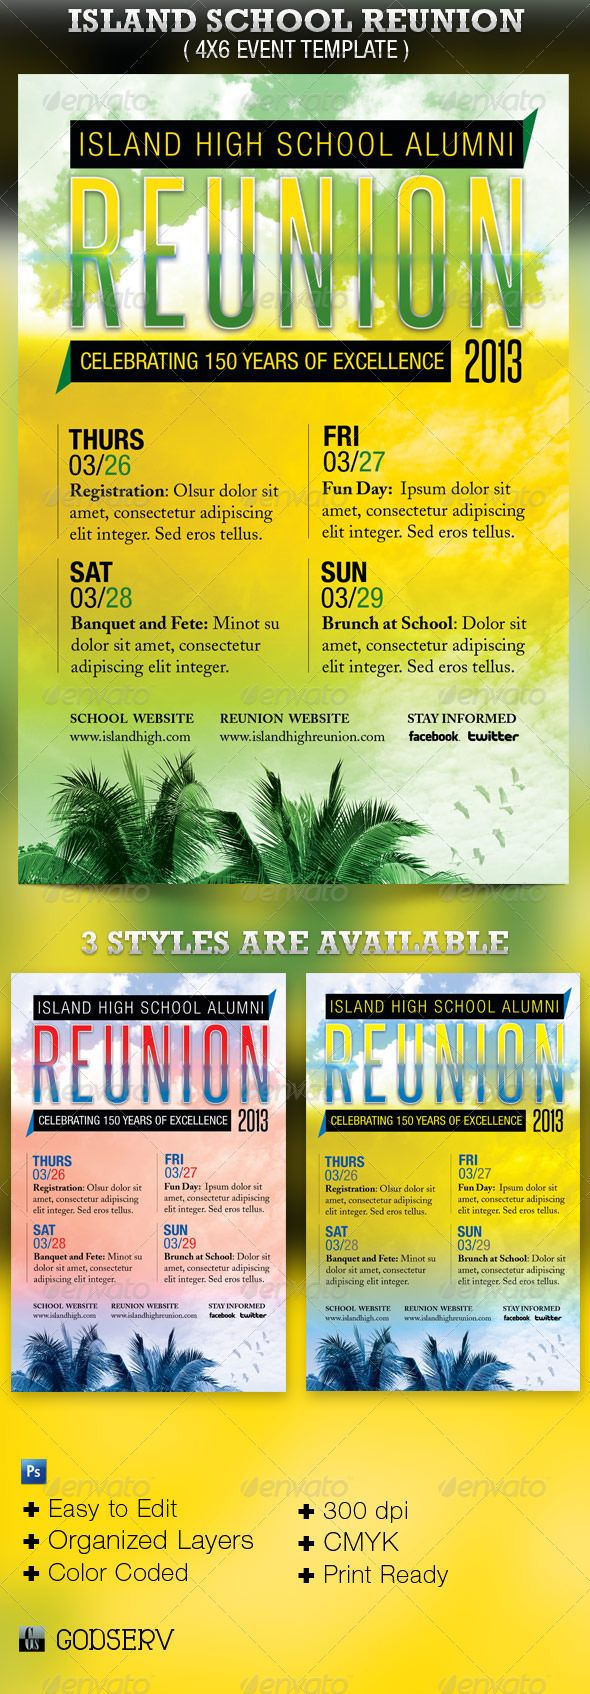 Island School Reunion Flyer Template - $6.00